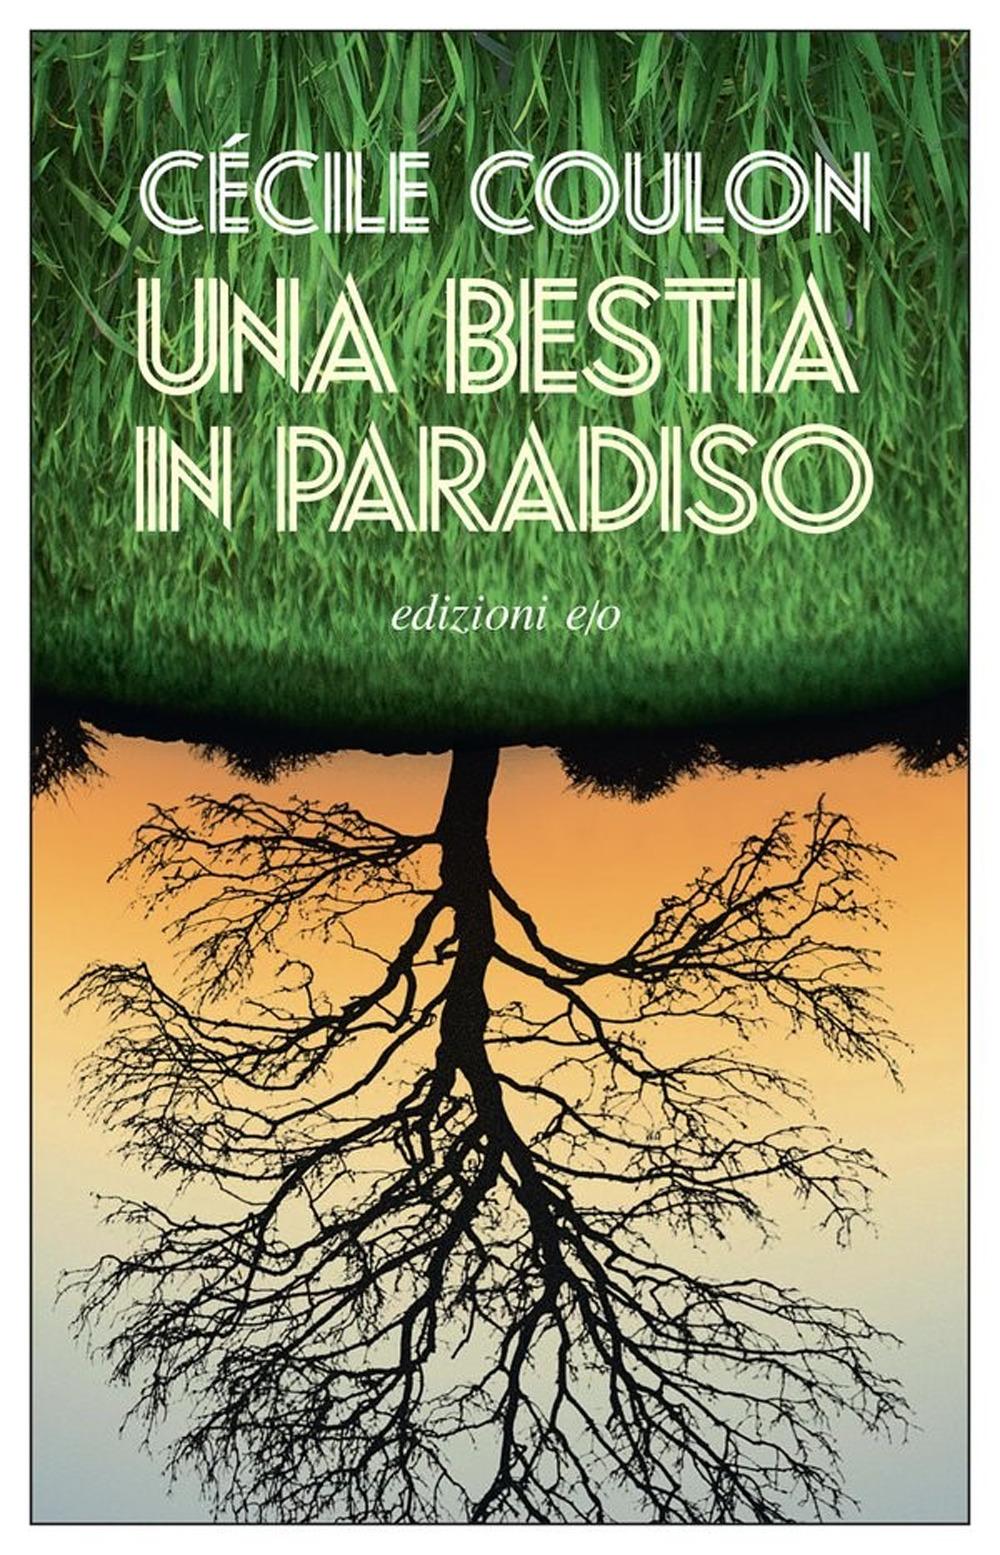 BESTIA IN PARADISO (UNA) - 9788833573700